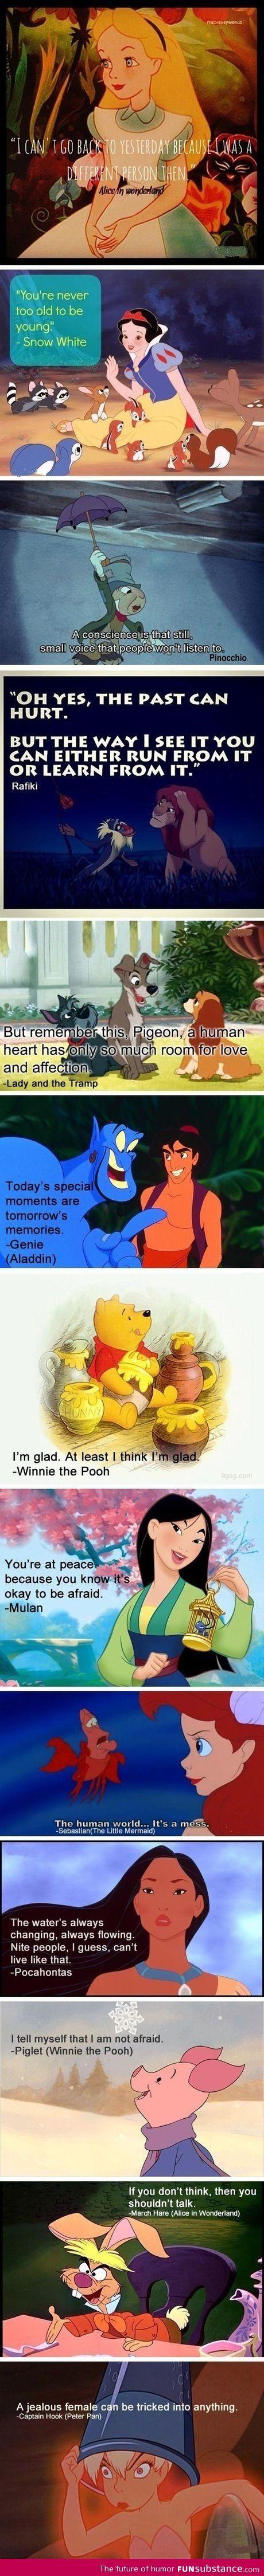 Disney Quotes compilation